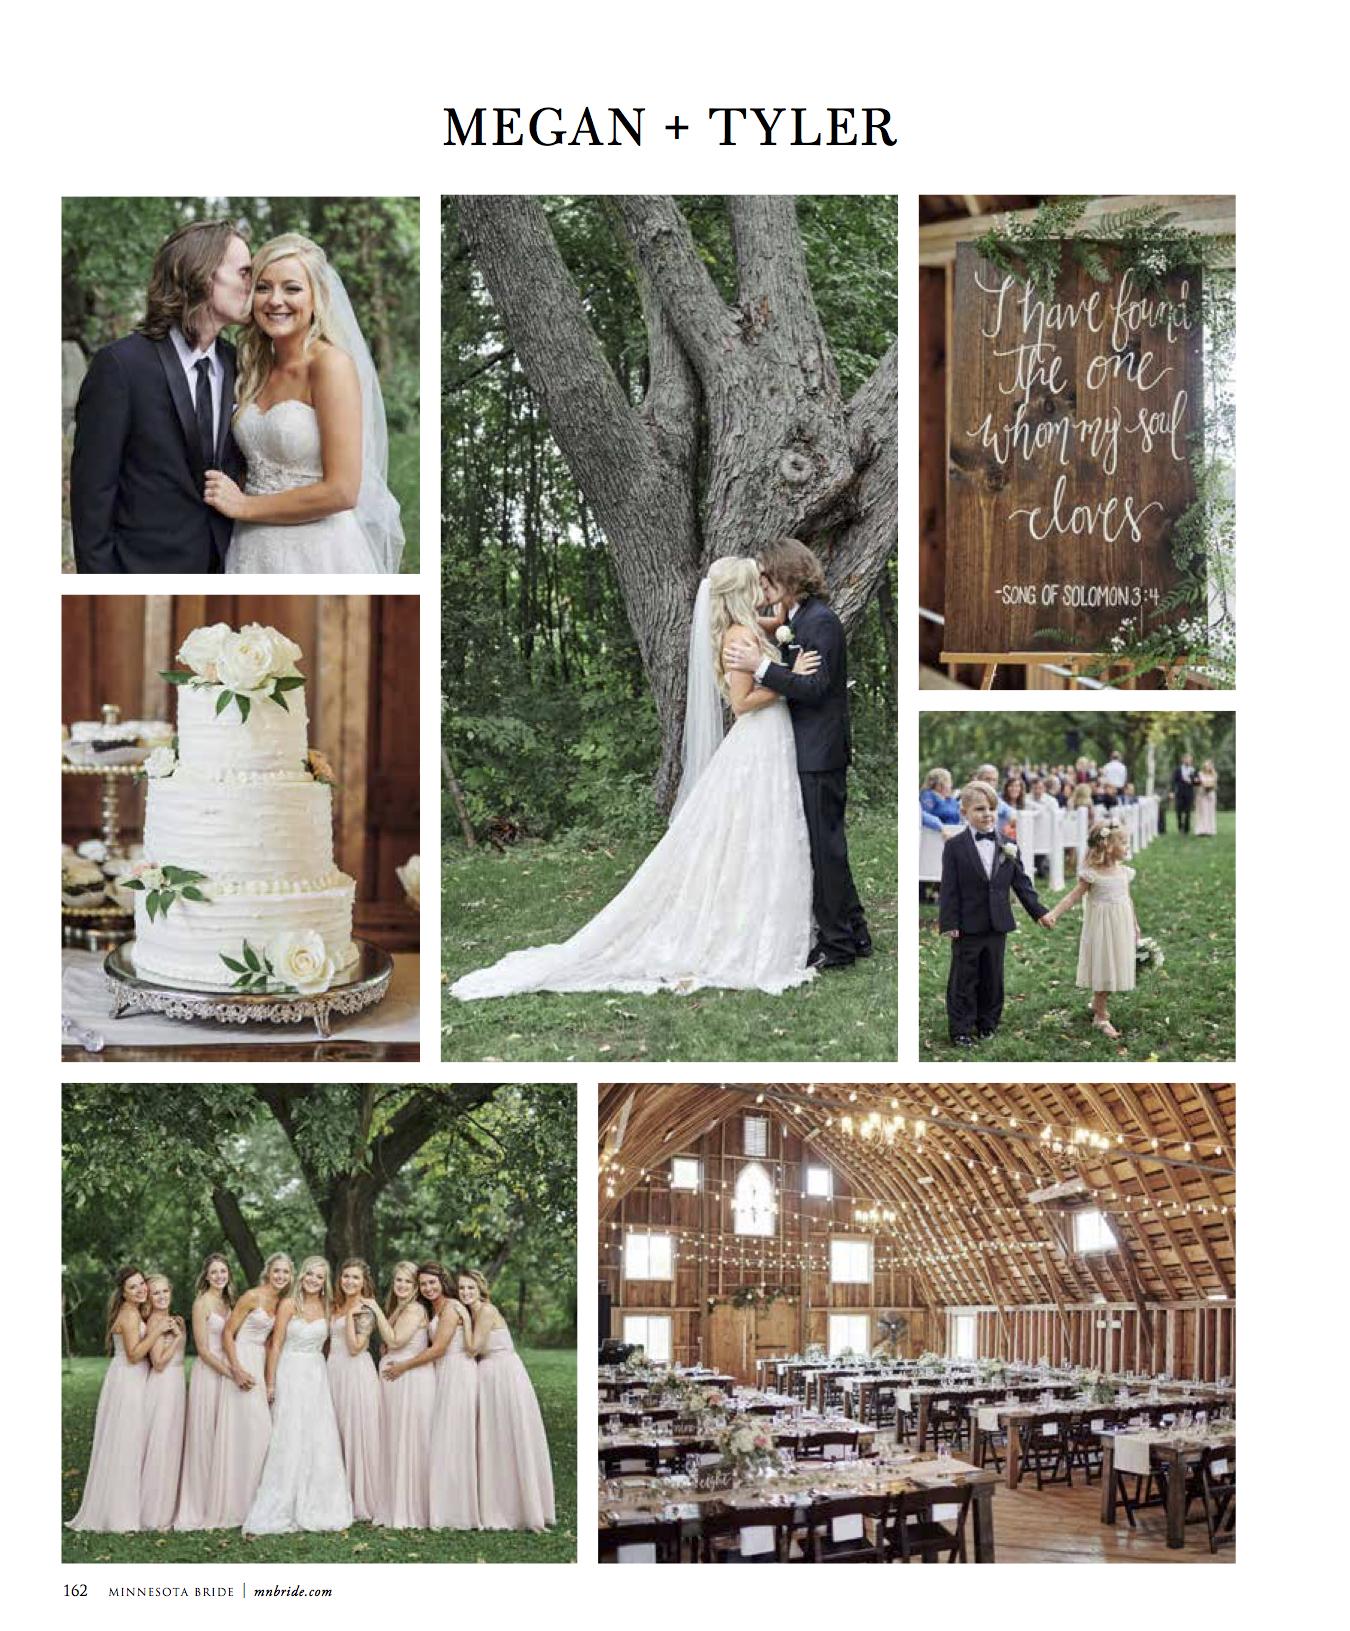 tyler-megan-bloom-lake-barn-wedding-minnesota-bride-magazine-minneapolis-mn